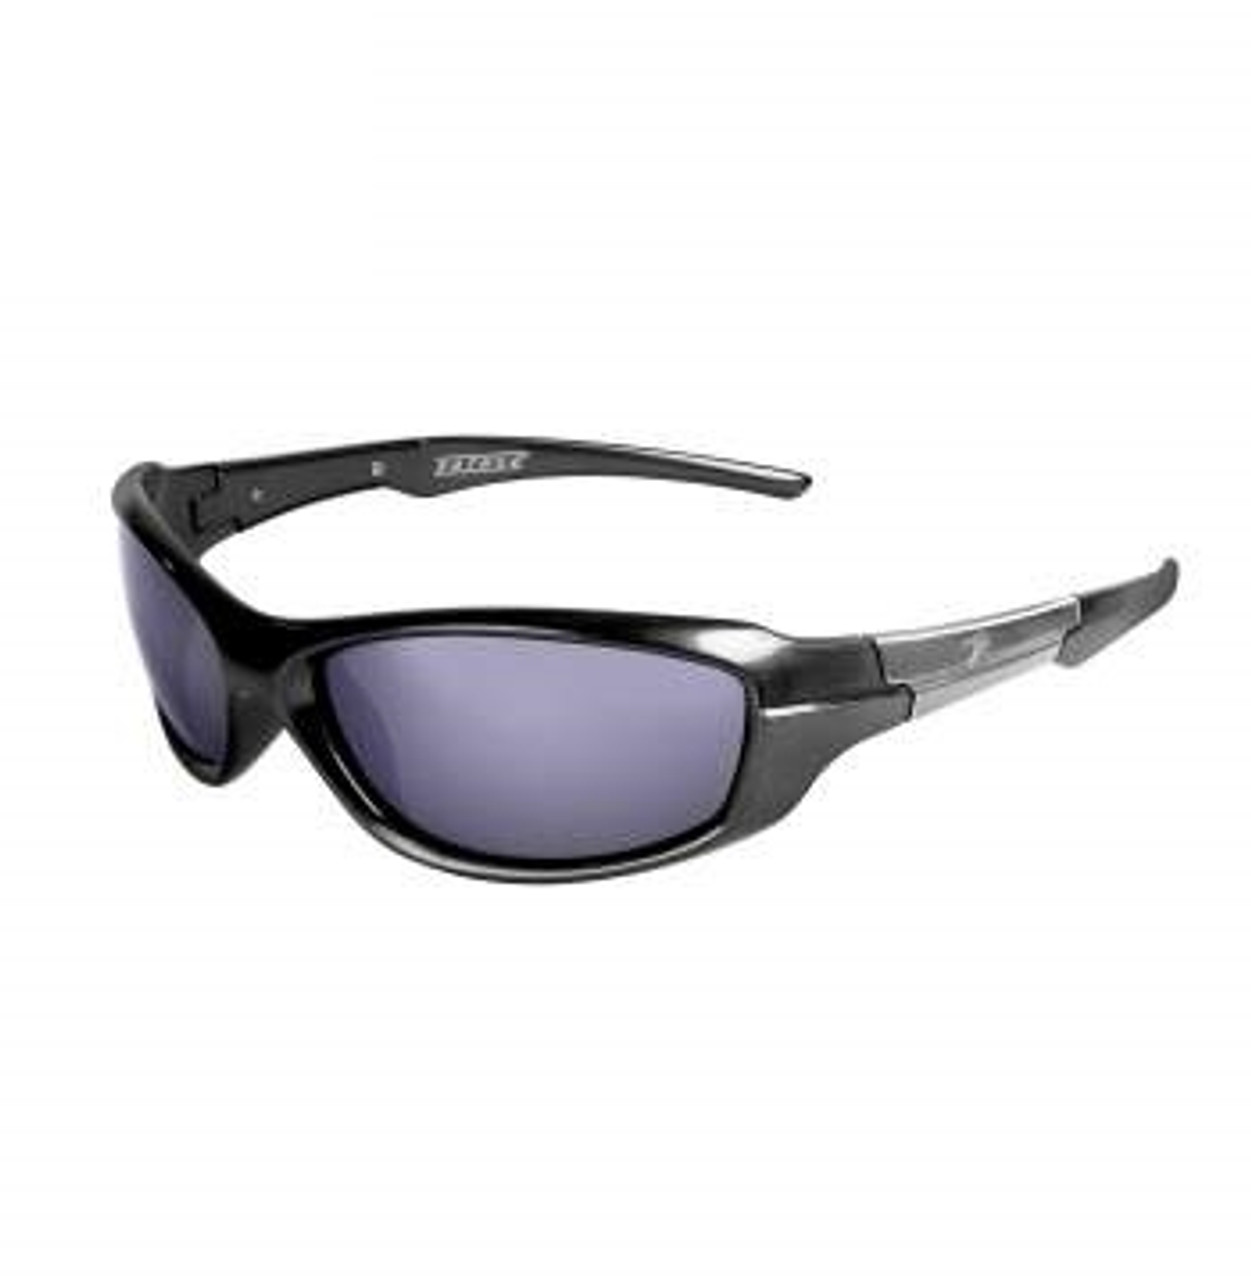 9MM Sunglasses- Black/ Smoke from Hessen Antique